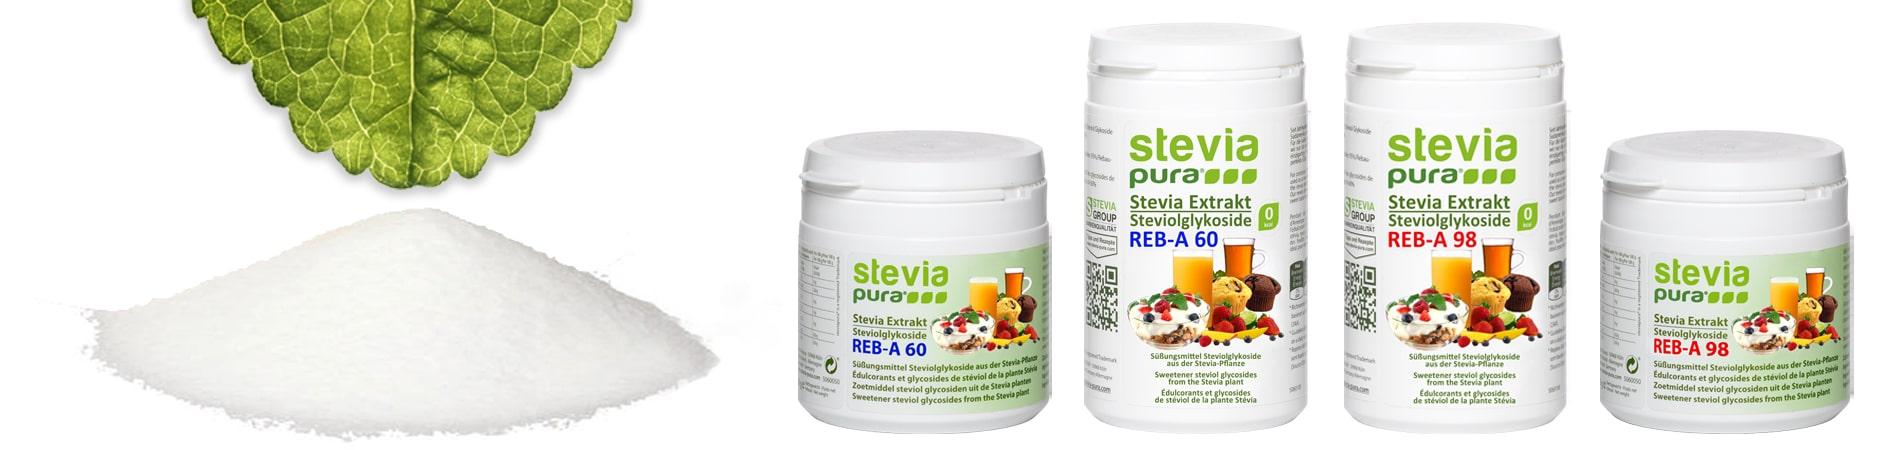 Reines Stevia Pulver kaufen Rebaudiosid-A Steviolglykoside